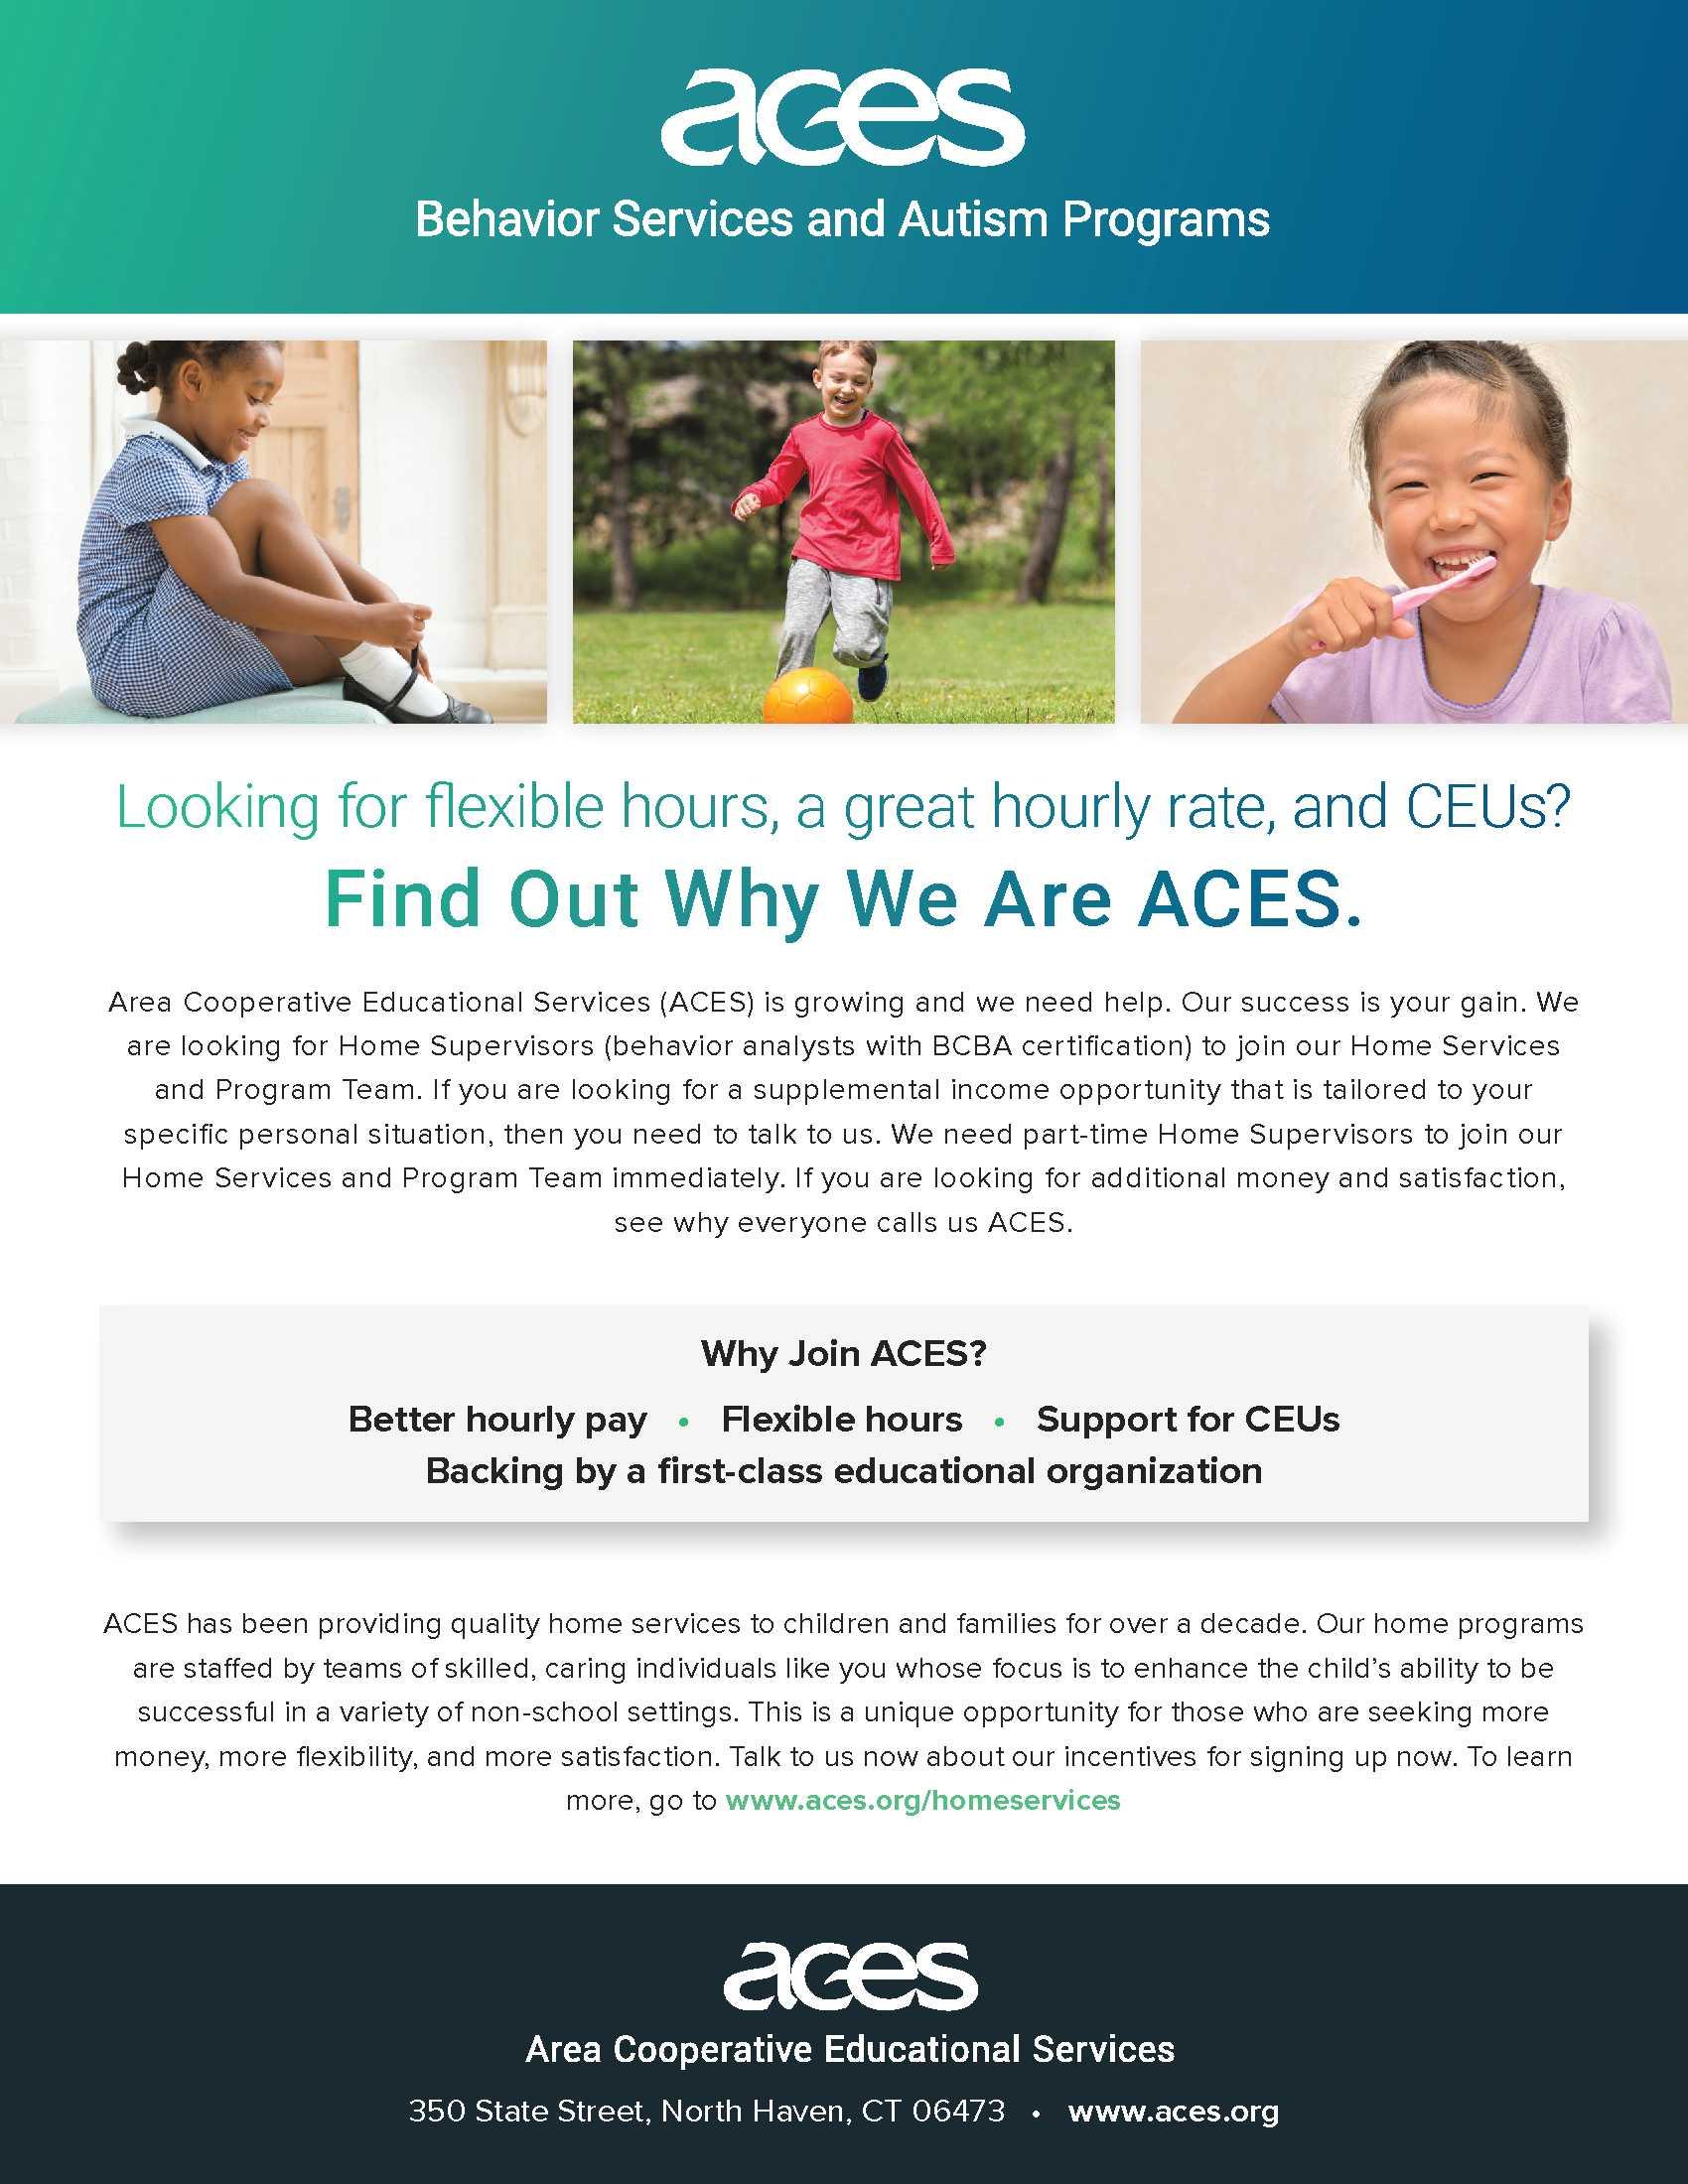 ACES AD